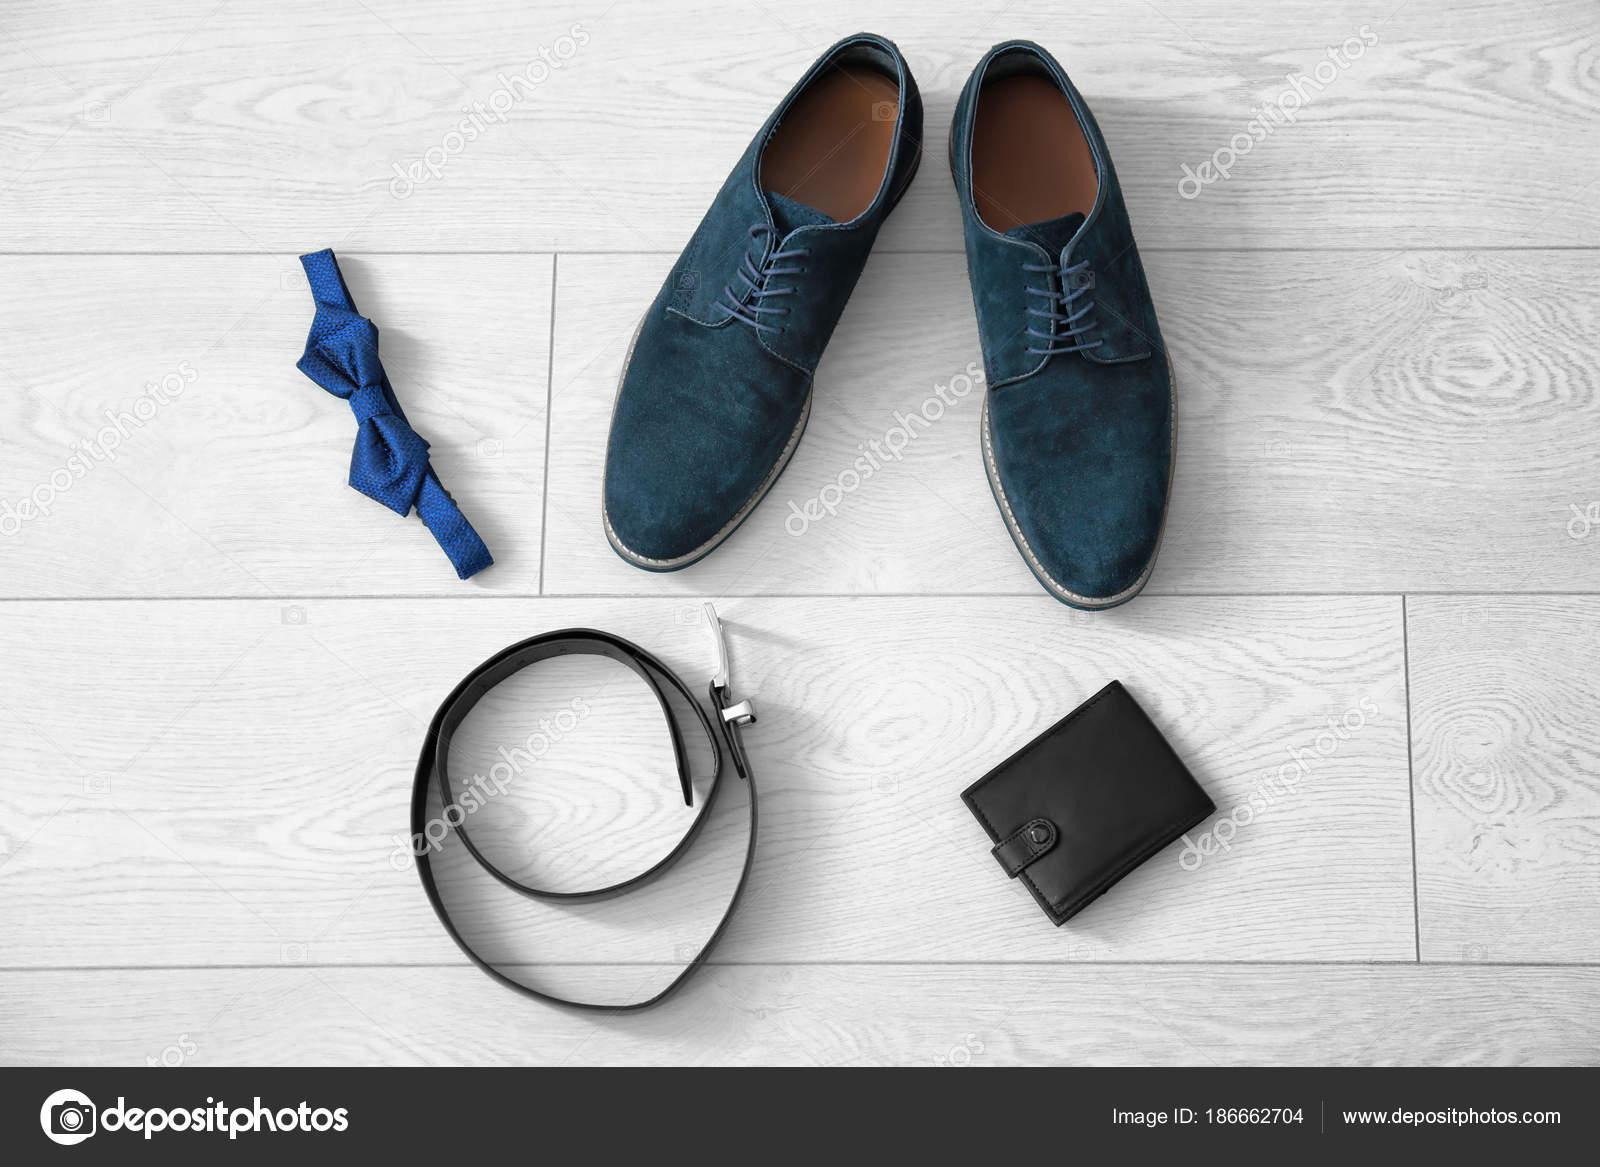 Con — Foto Zapatos Elegantes Planta Composición Hombre De Stock gyvfIY7mb6